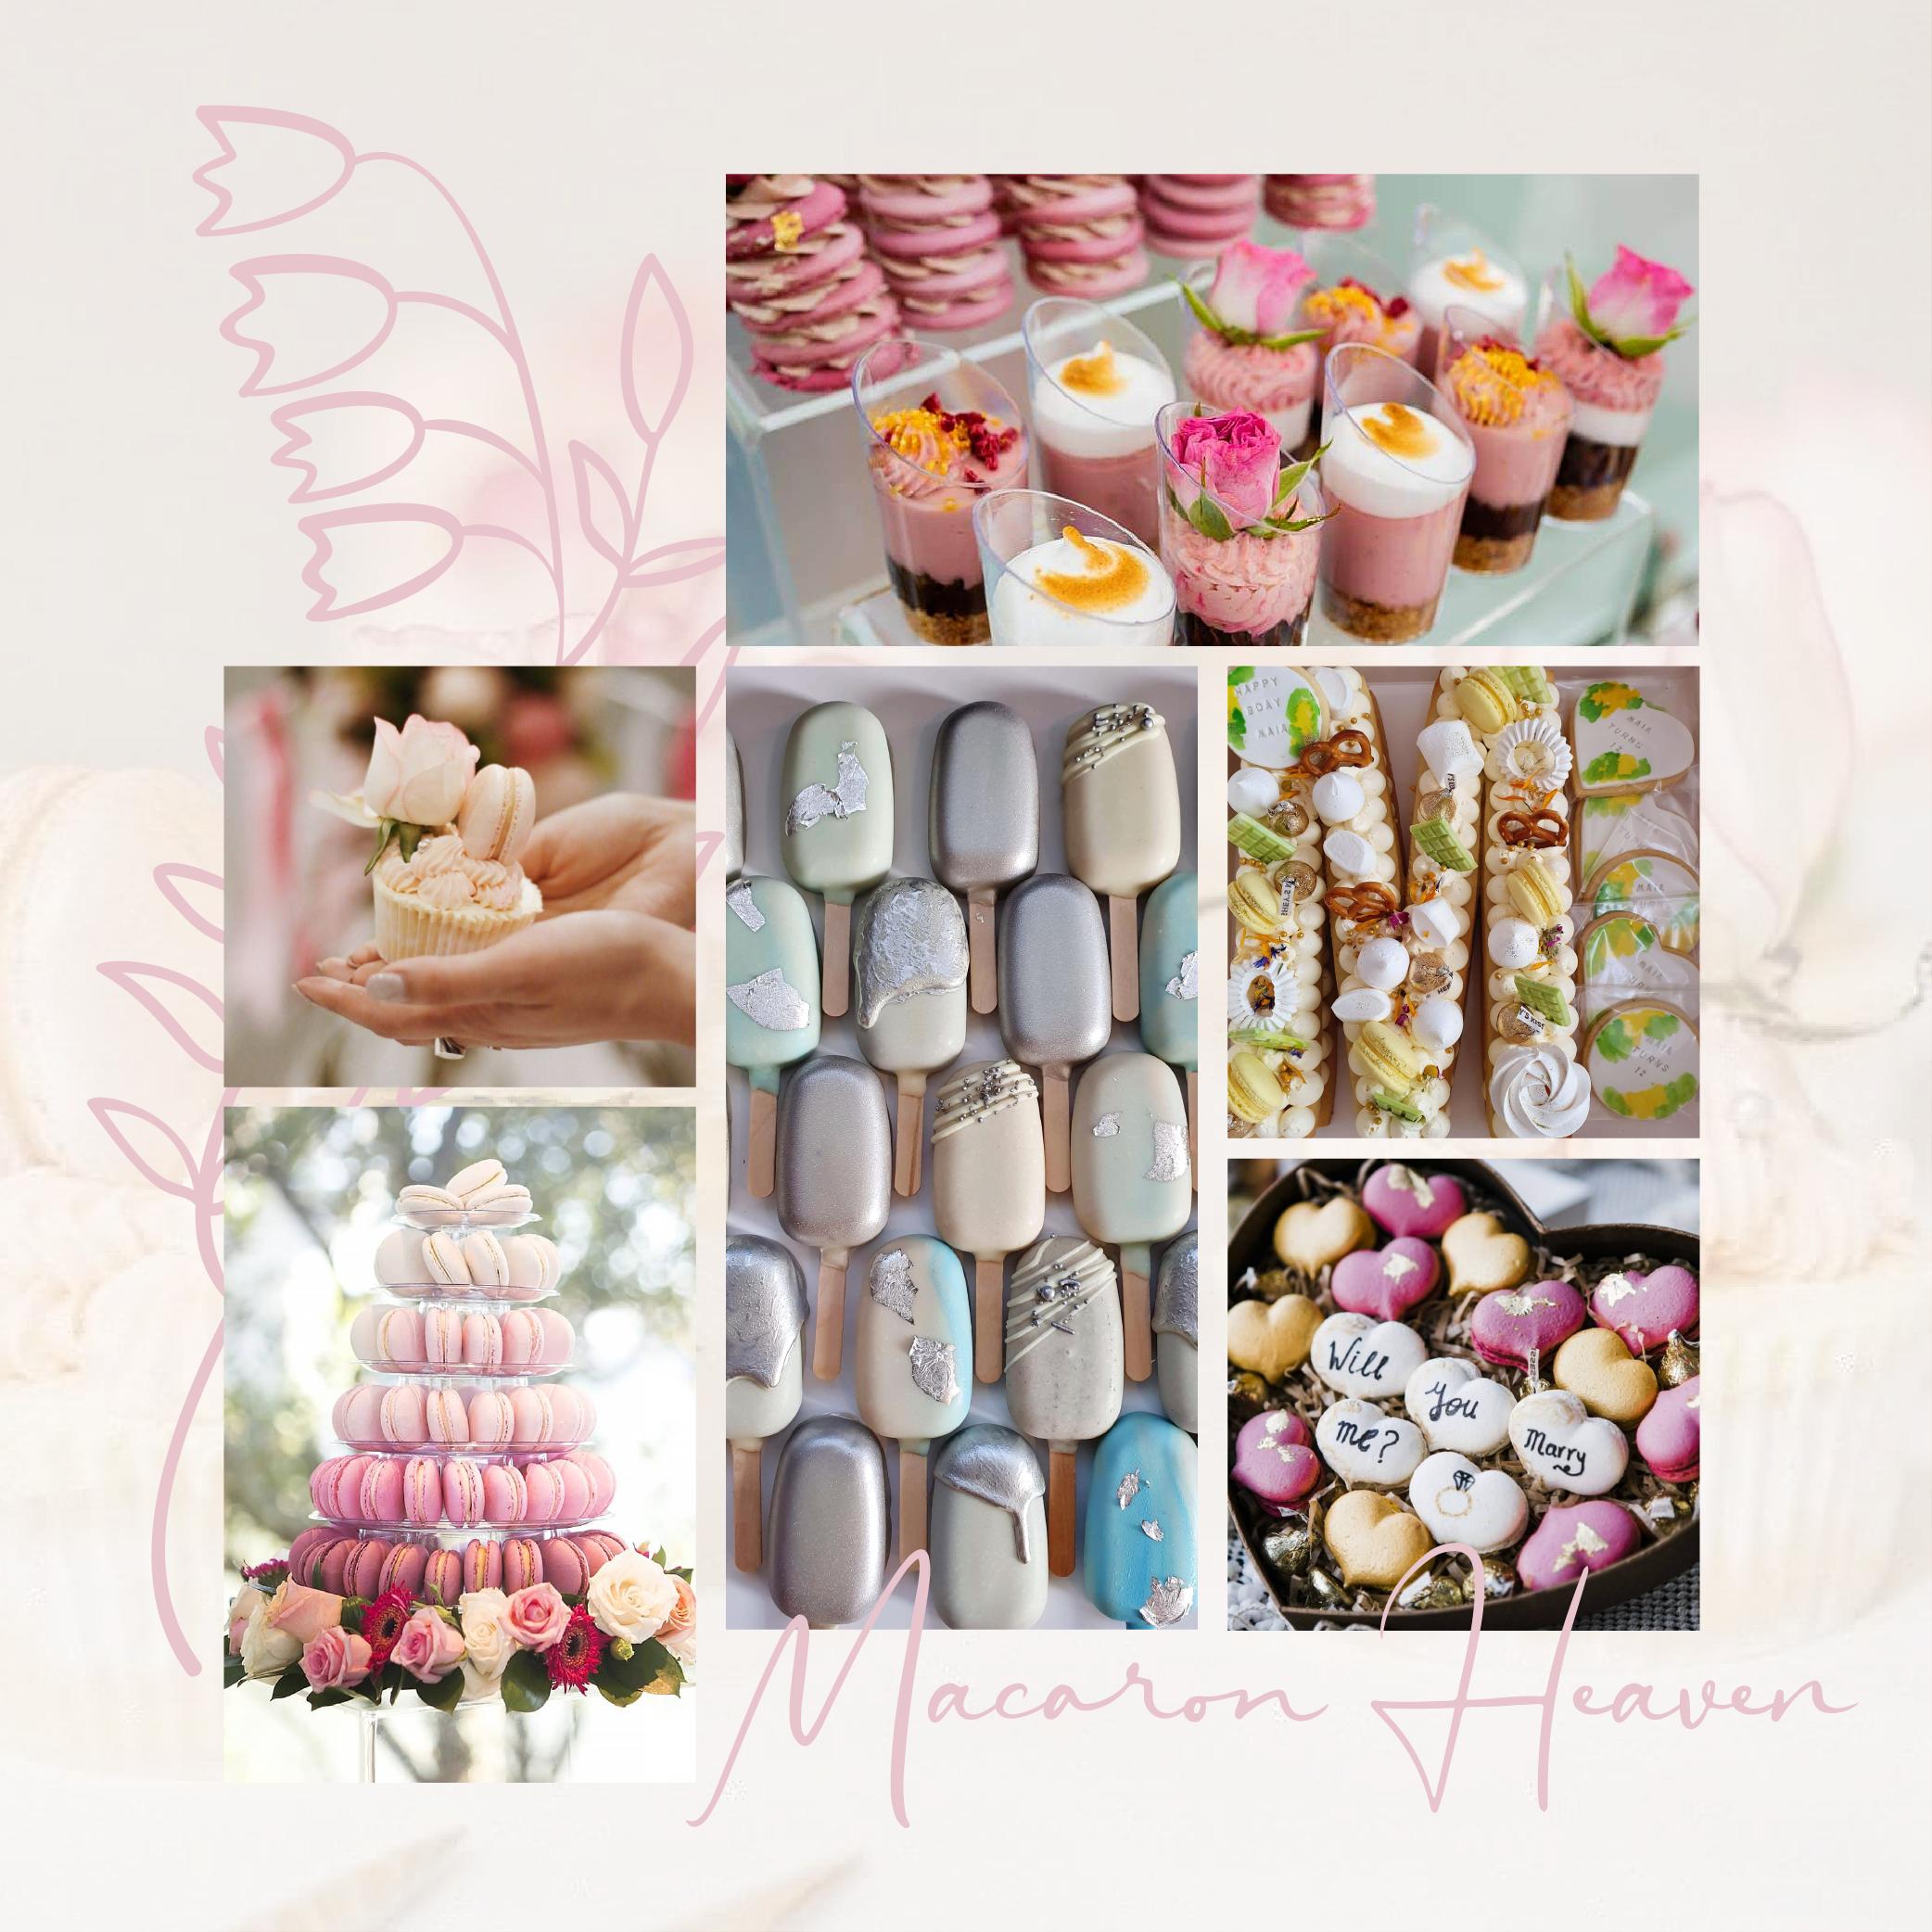 Macaron Heaven Moodboard 2-01.png